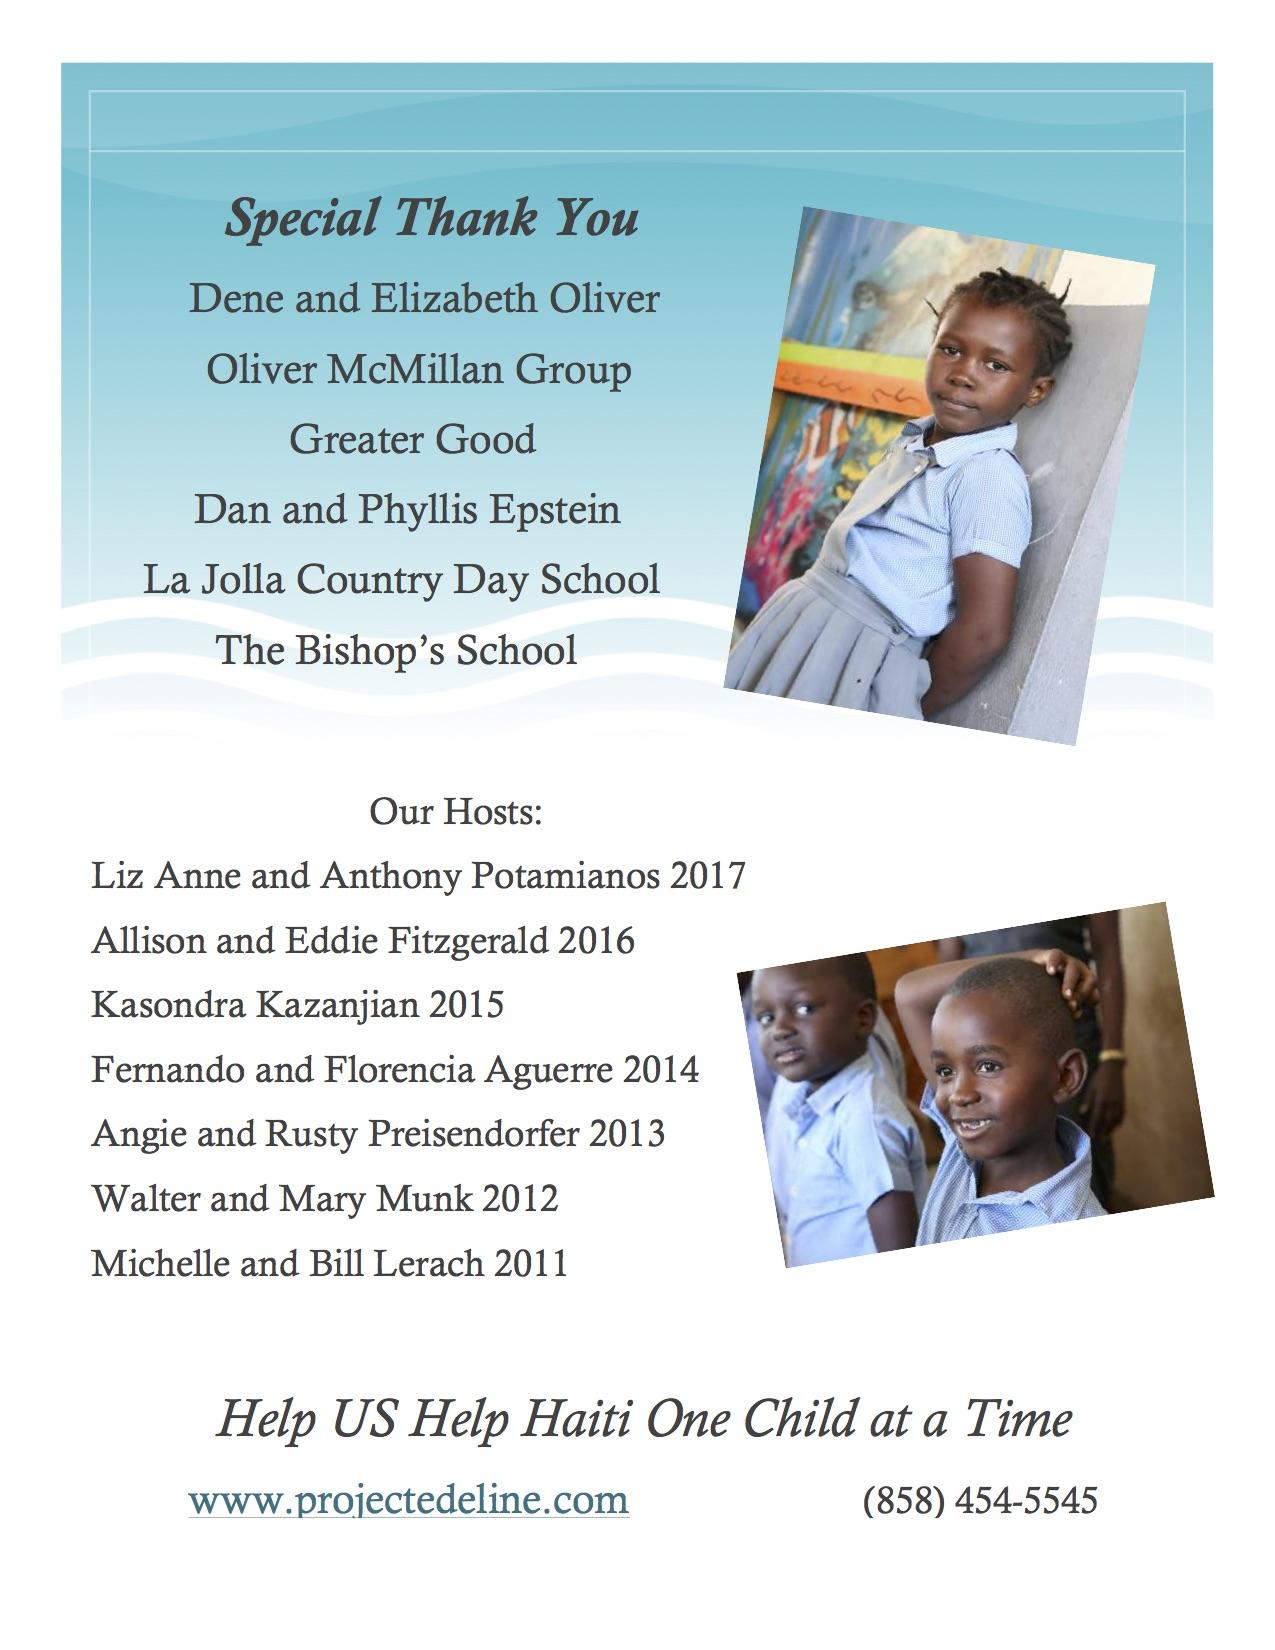 Haiti newsletter 2017-ilovepdf-compressed-9.jpg